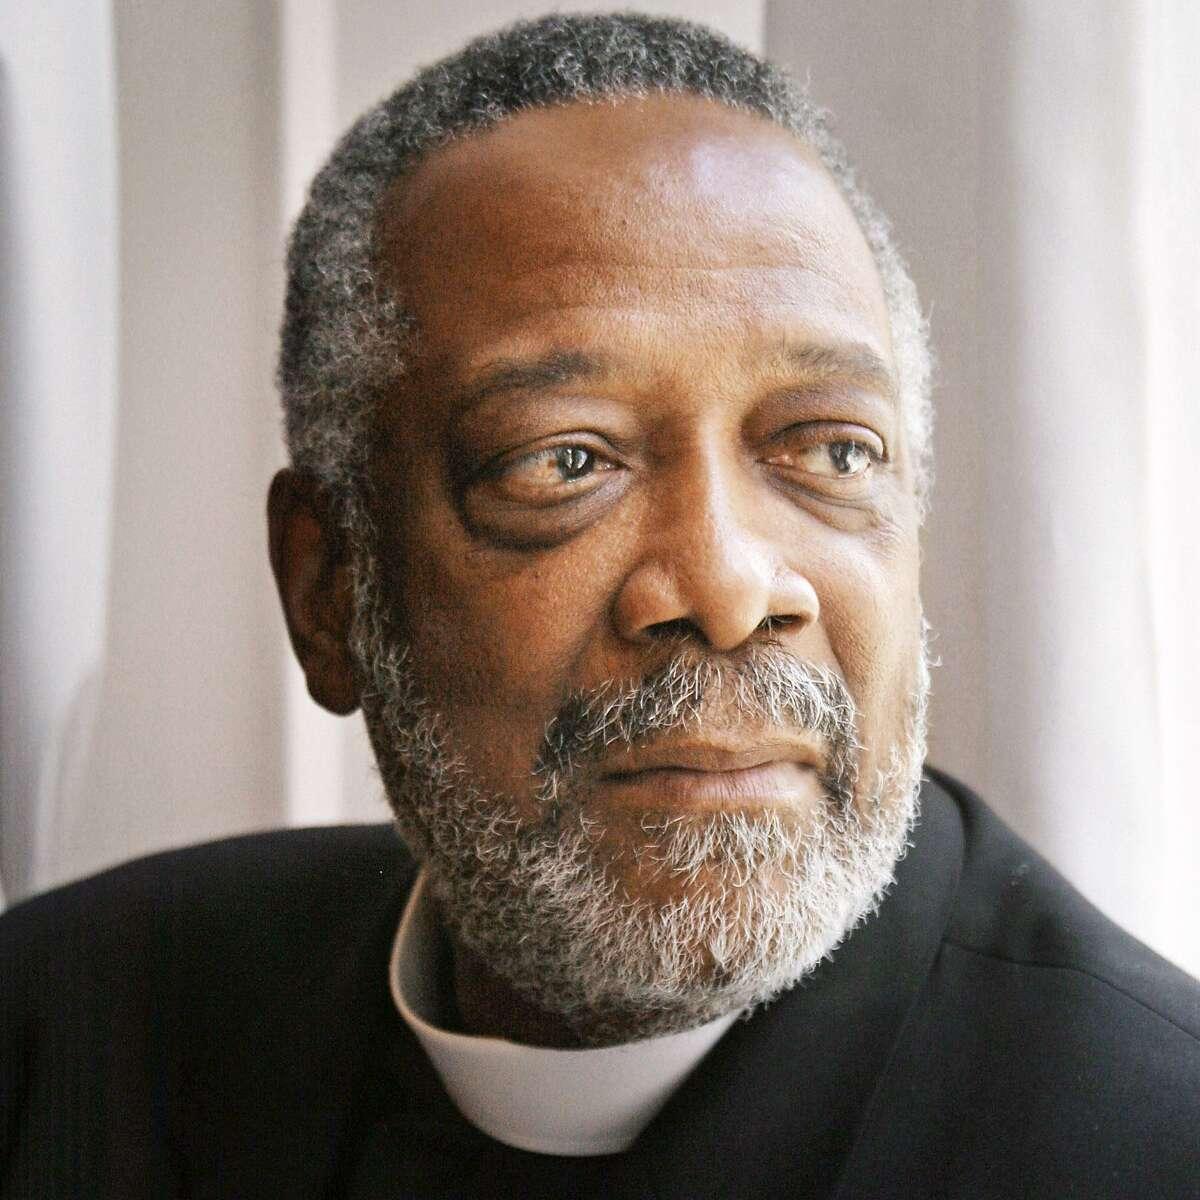 Rev. Edwin C. Sanders II, a 1969 Wesleyan University graduate, is the senior servant and founder of Metropolitan Interdenominational Church in Nashville, Tennessee.